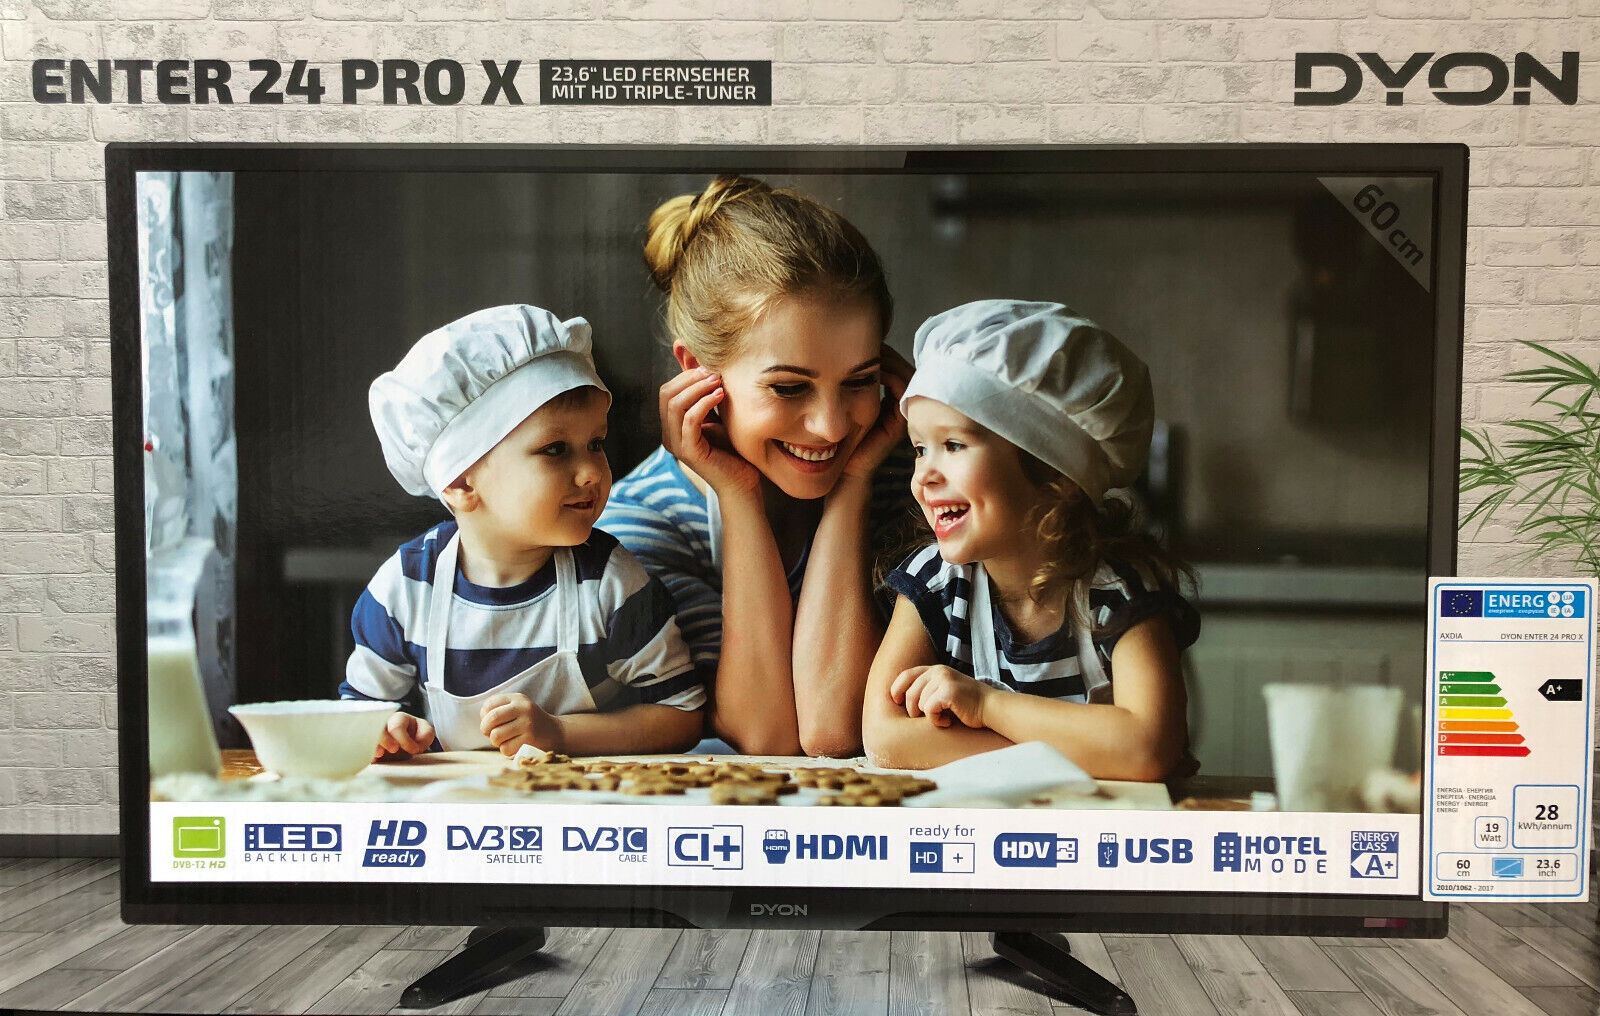 Dyon 24 Zoll Fernseher LED TV Enter Pro X HD Triple Tuner HDMI EEK: A Neu & OVP